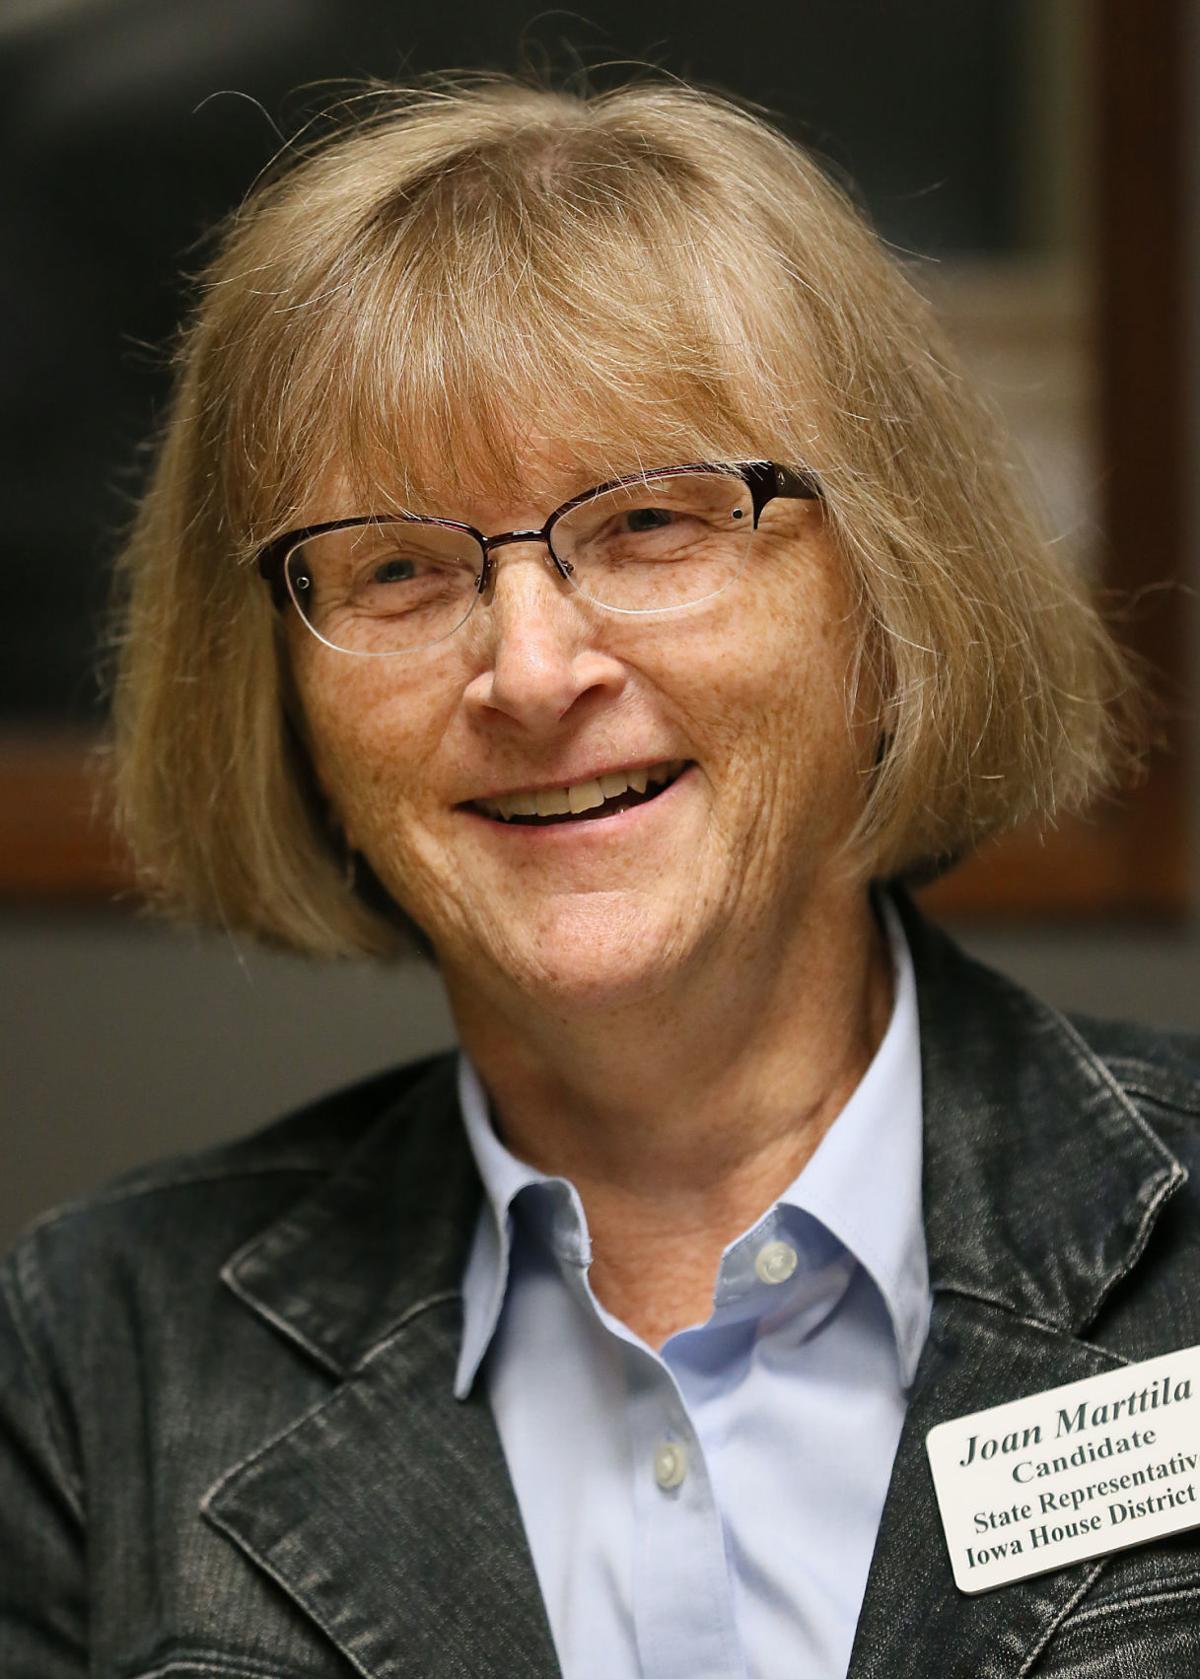 Joan Marttila